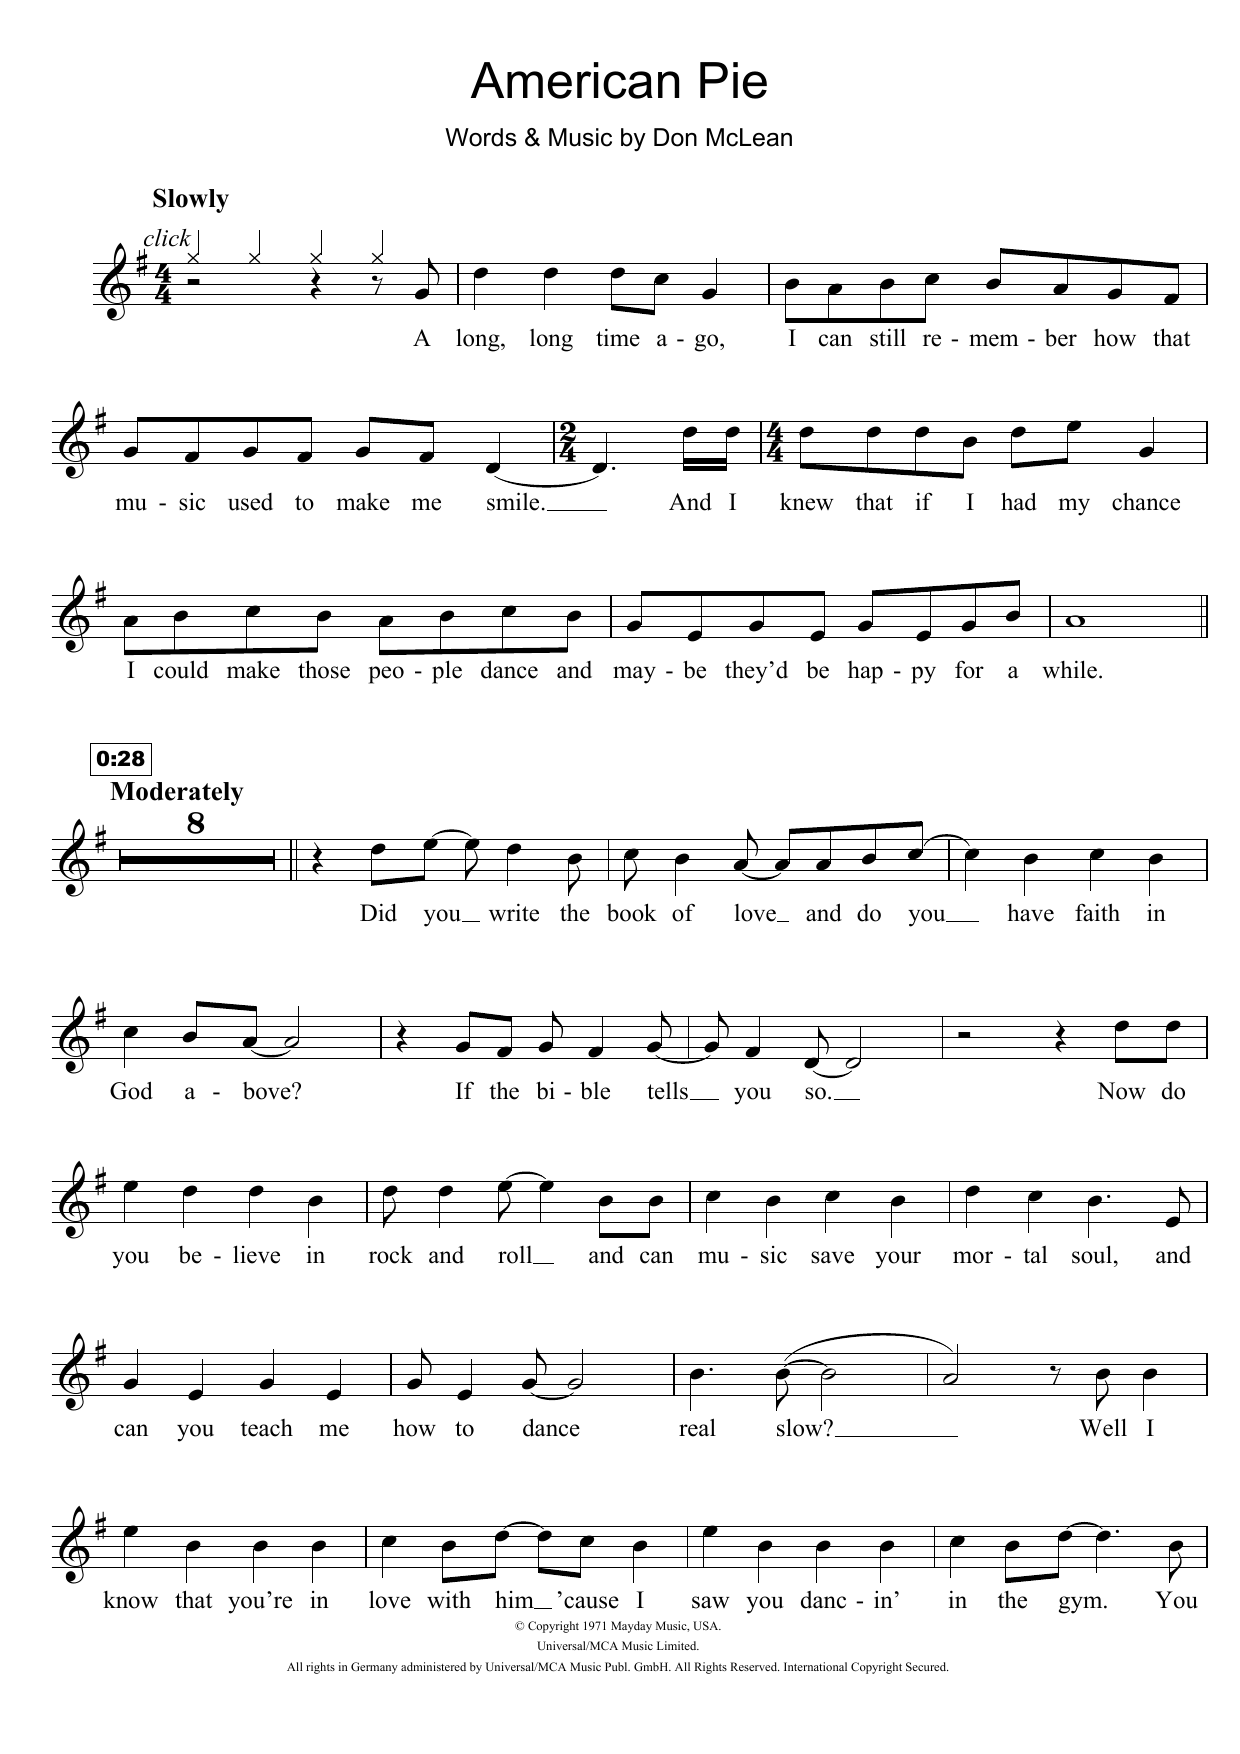 American Pie Sheet Music